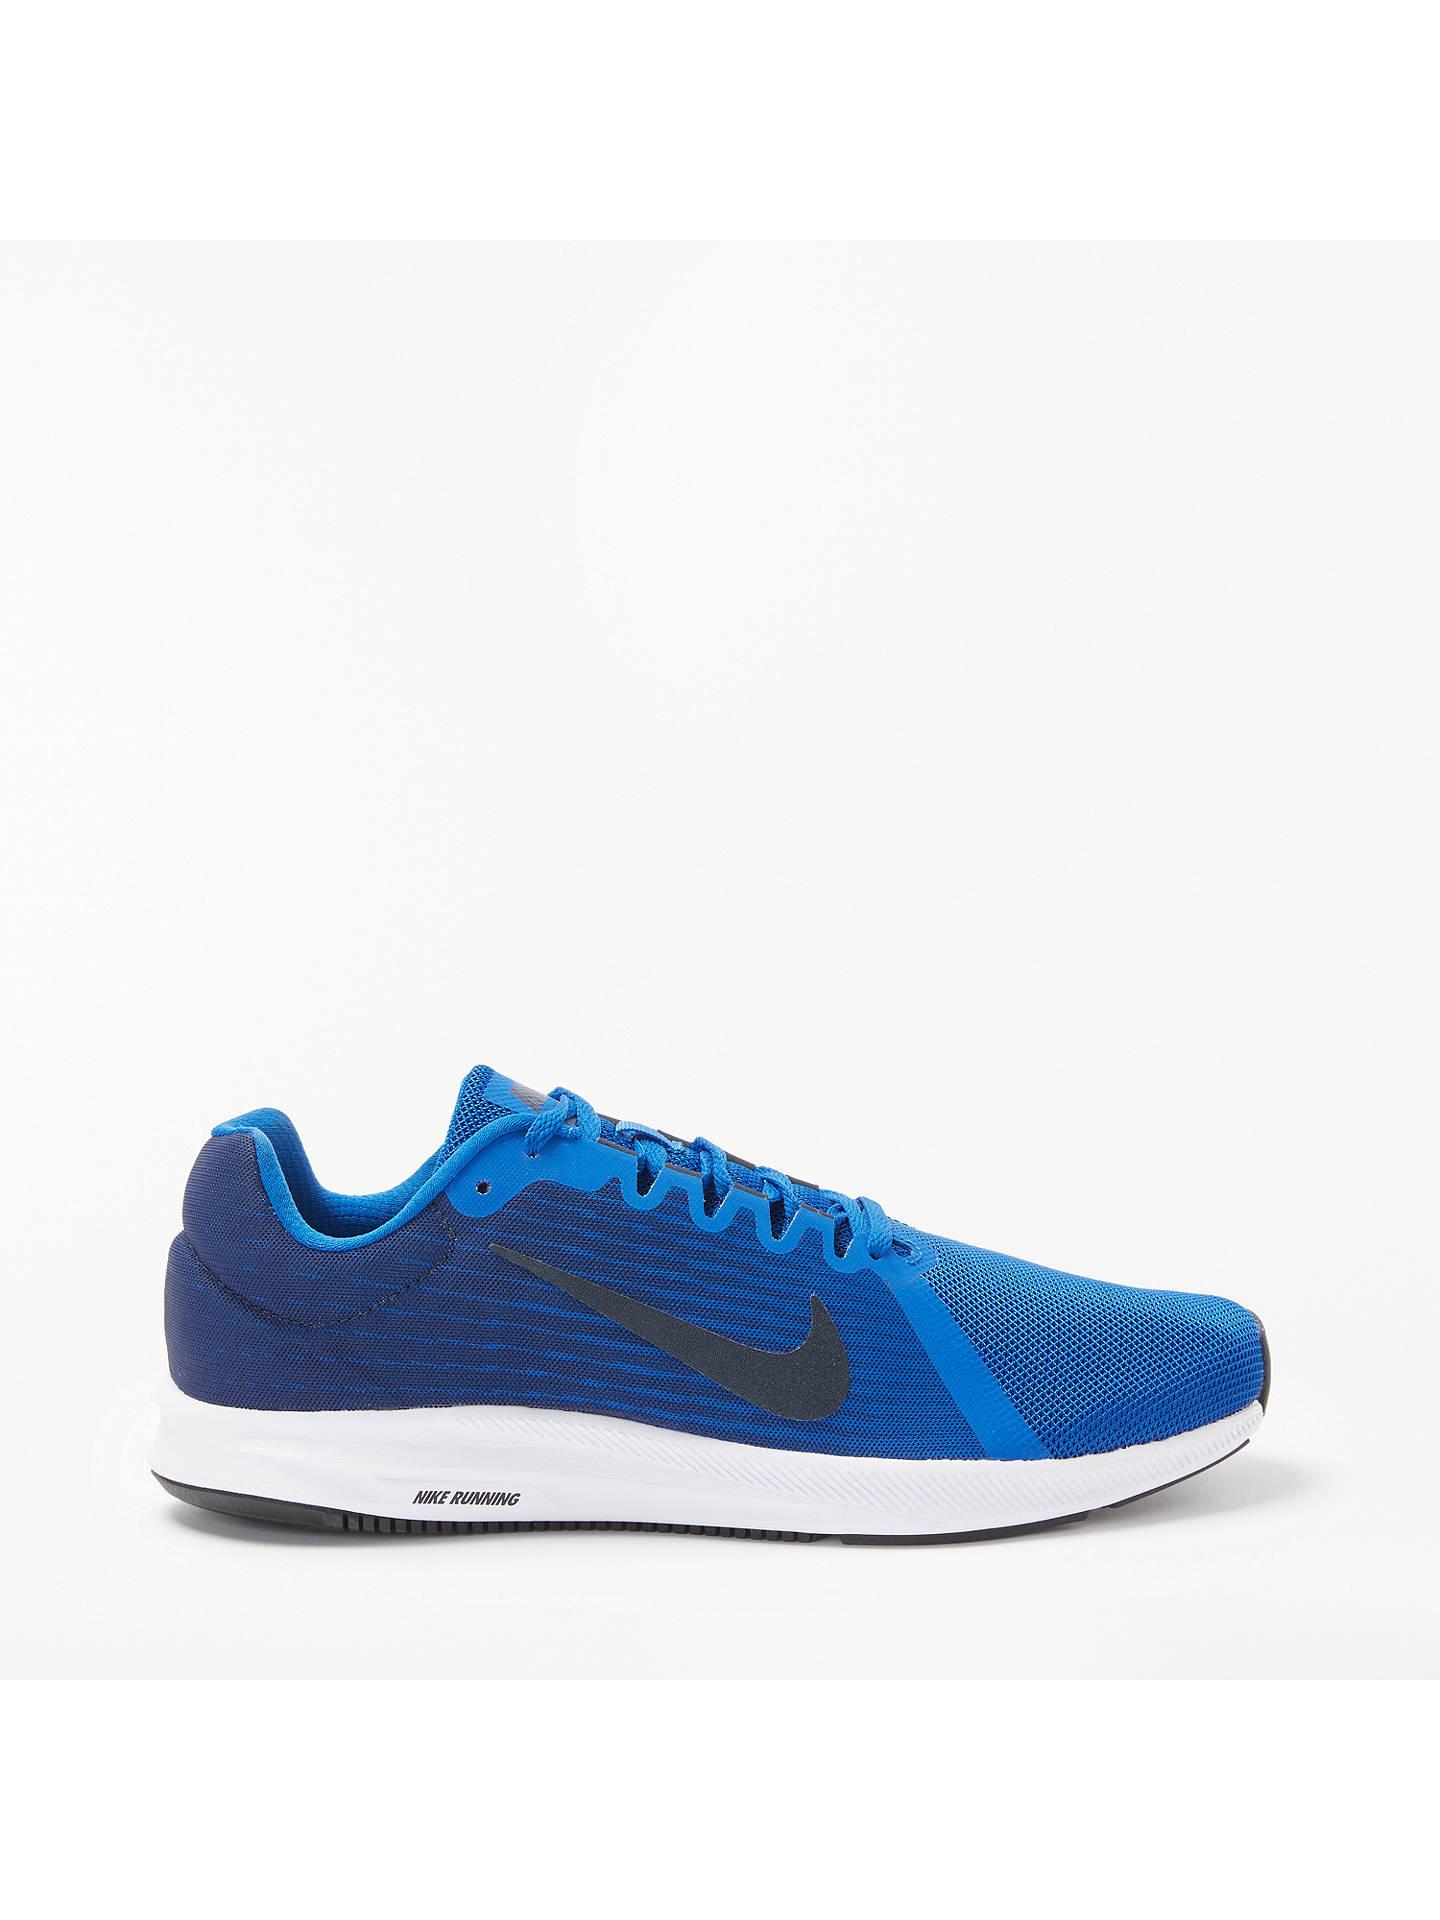 224ca18c0d089 Buy Nike Downshifter 8 Men s Running Shoes